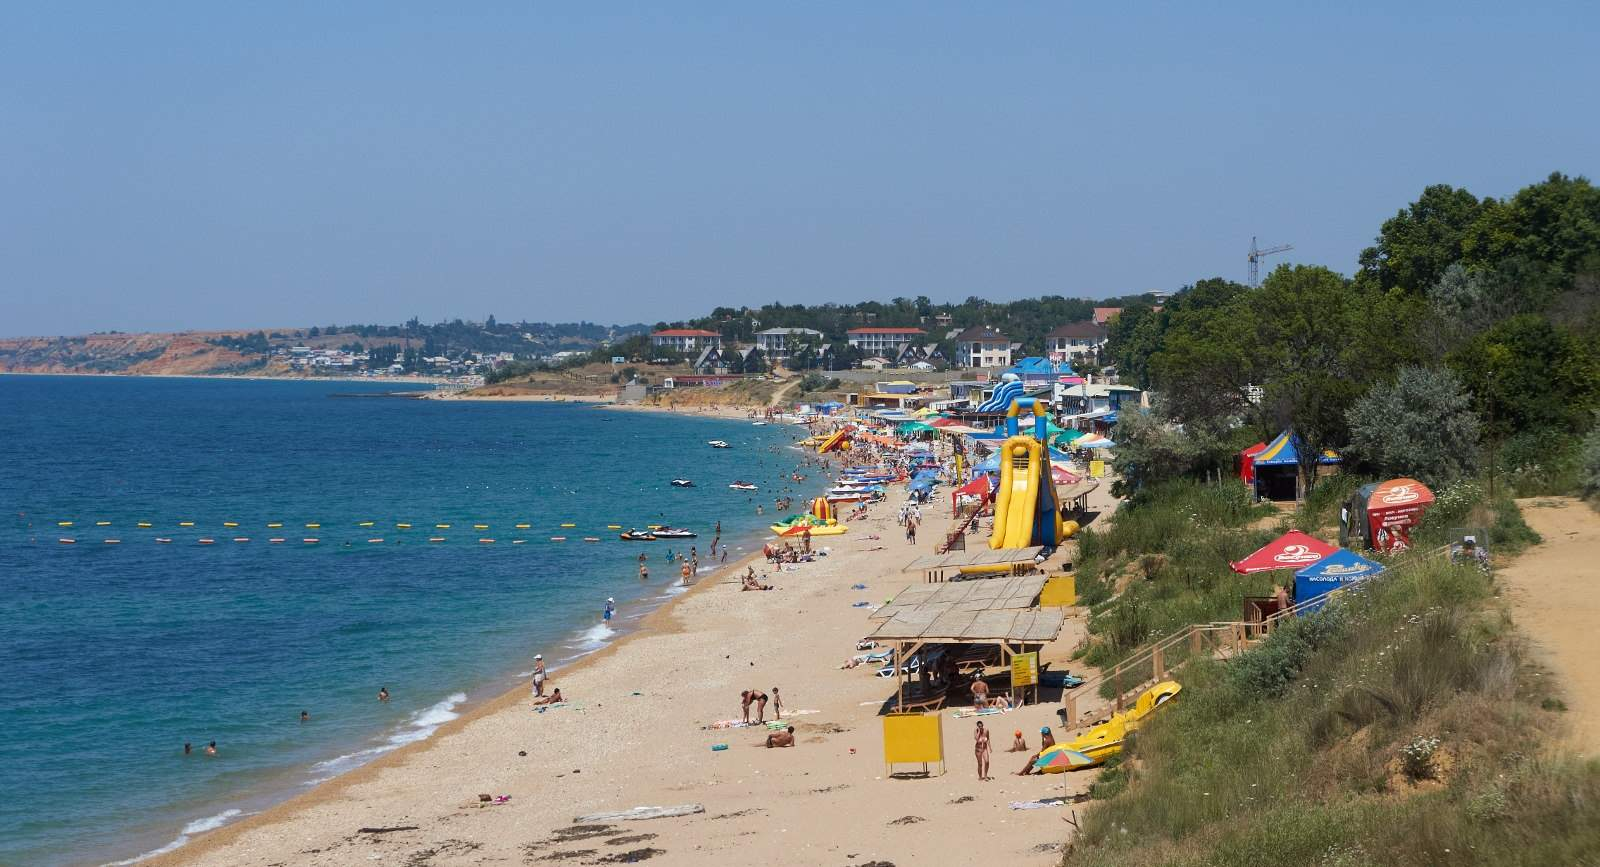 Учкуевка фото поселка и пляжа 2018